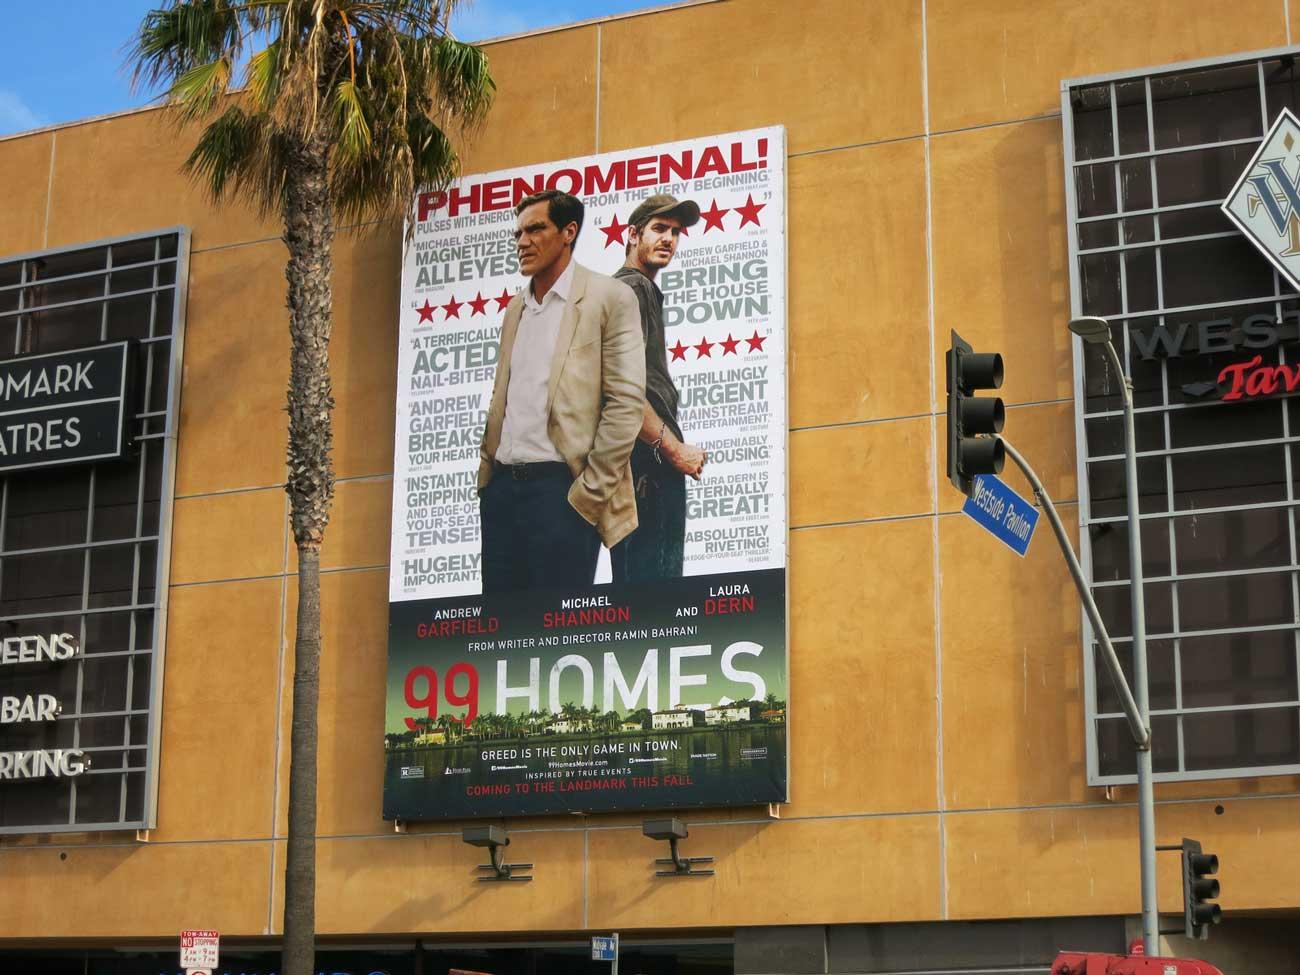 olson visual creates a super large banner for 99 homes | olson visual